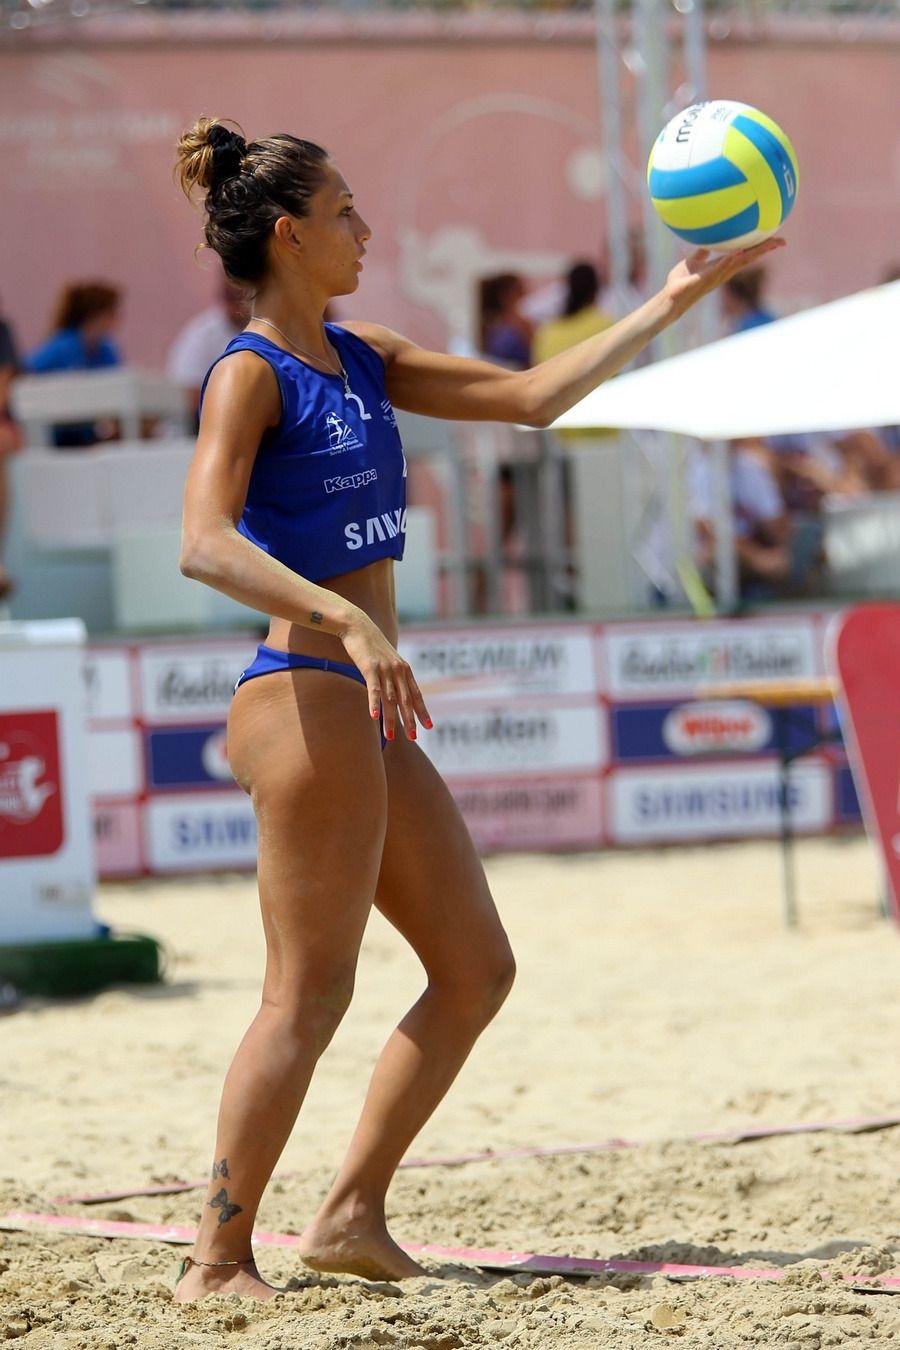 Beatrice Parrocchiale Pescara Italy July 23 2016 Volei Feminino Jogadoras De Volei Jogadores De Volei